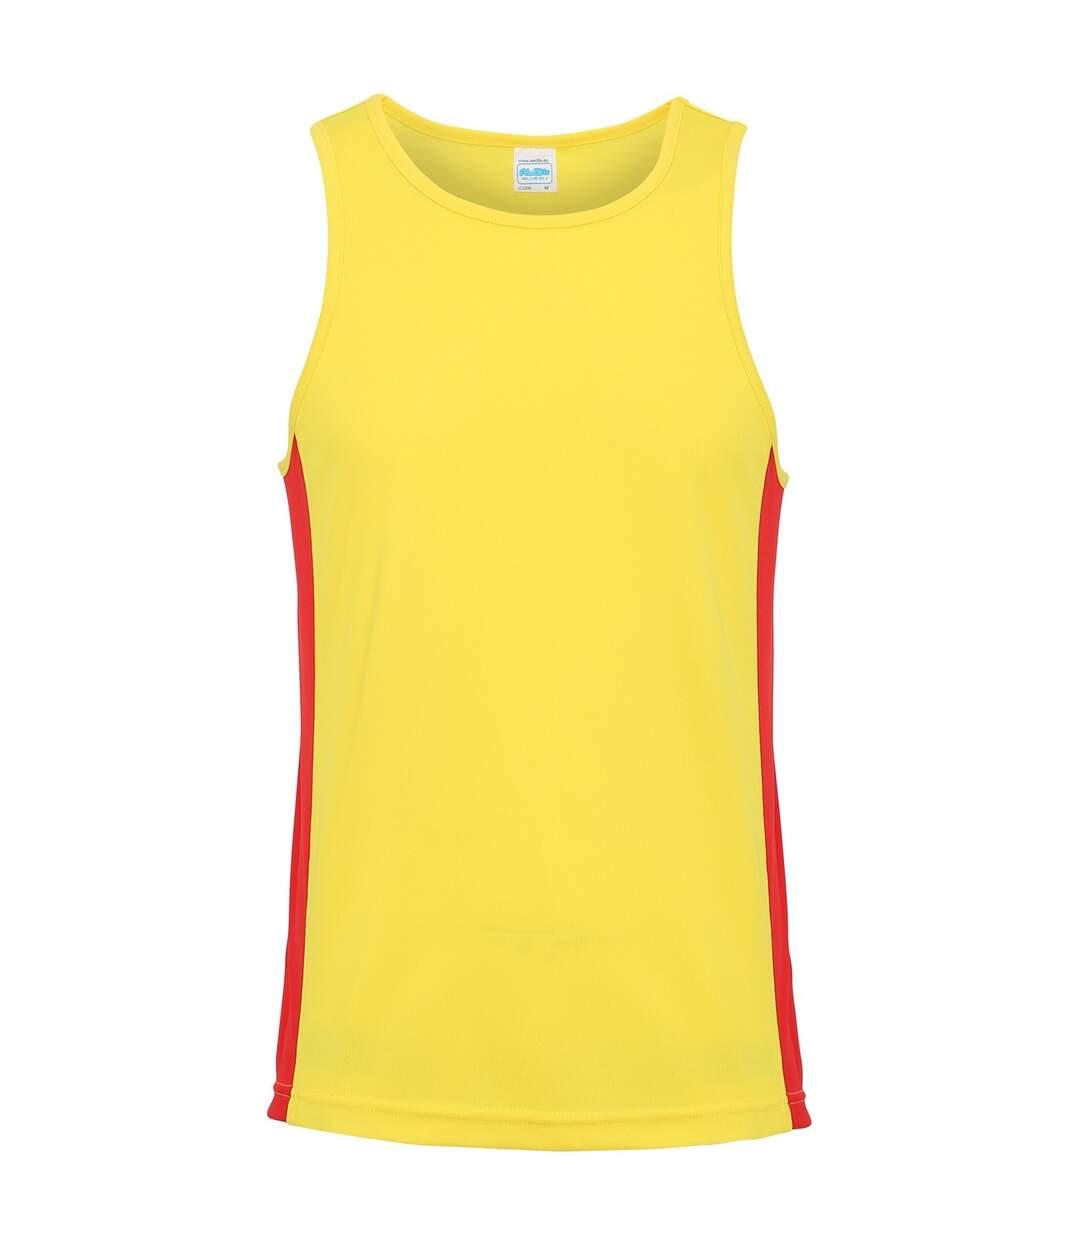 AWDis Just Cool Mens Contrast Panel Sports Vest Top (Jet Black/Arctic White) - UTRW3476